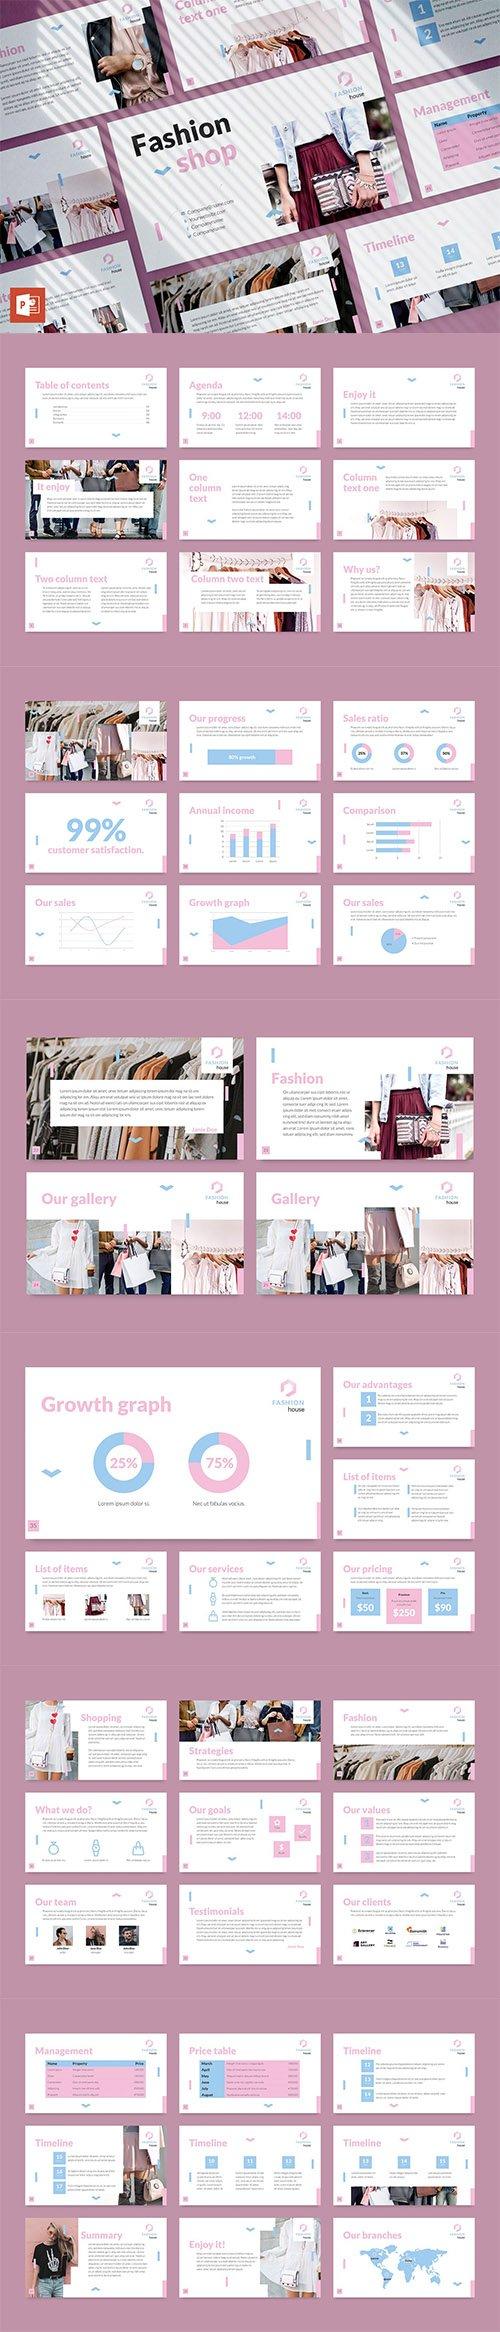 Fashion House PowerPoint Presentation Template